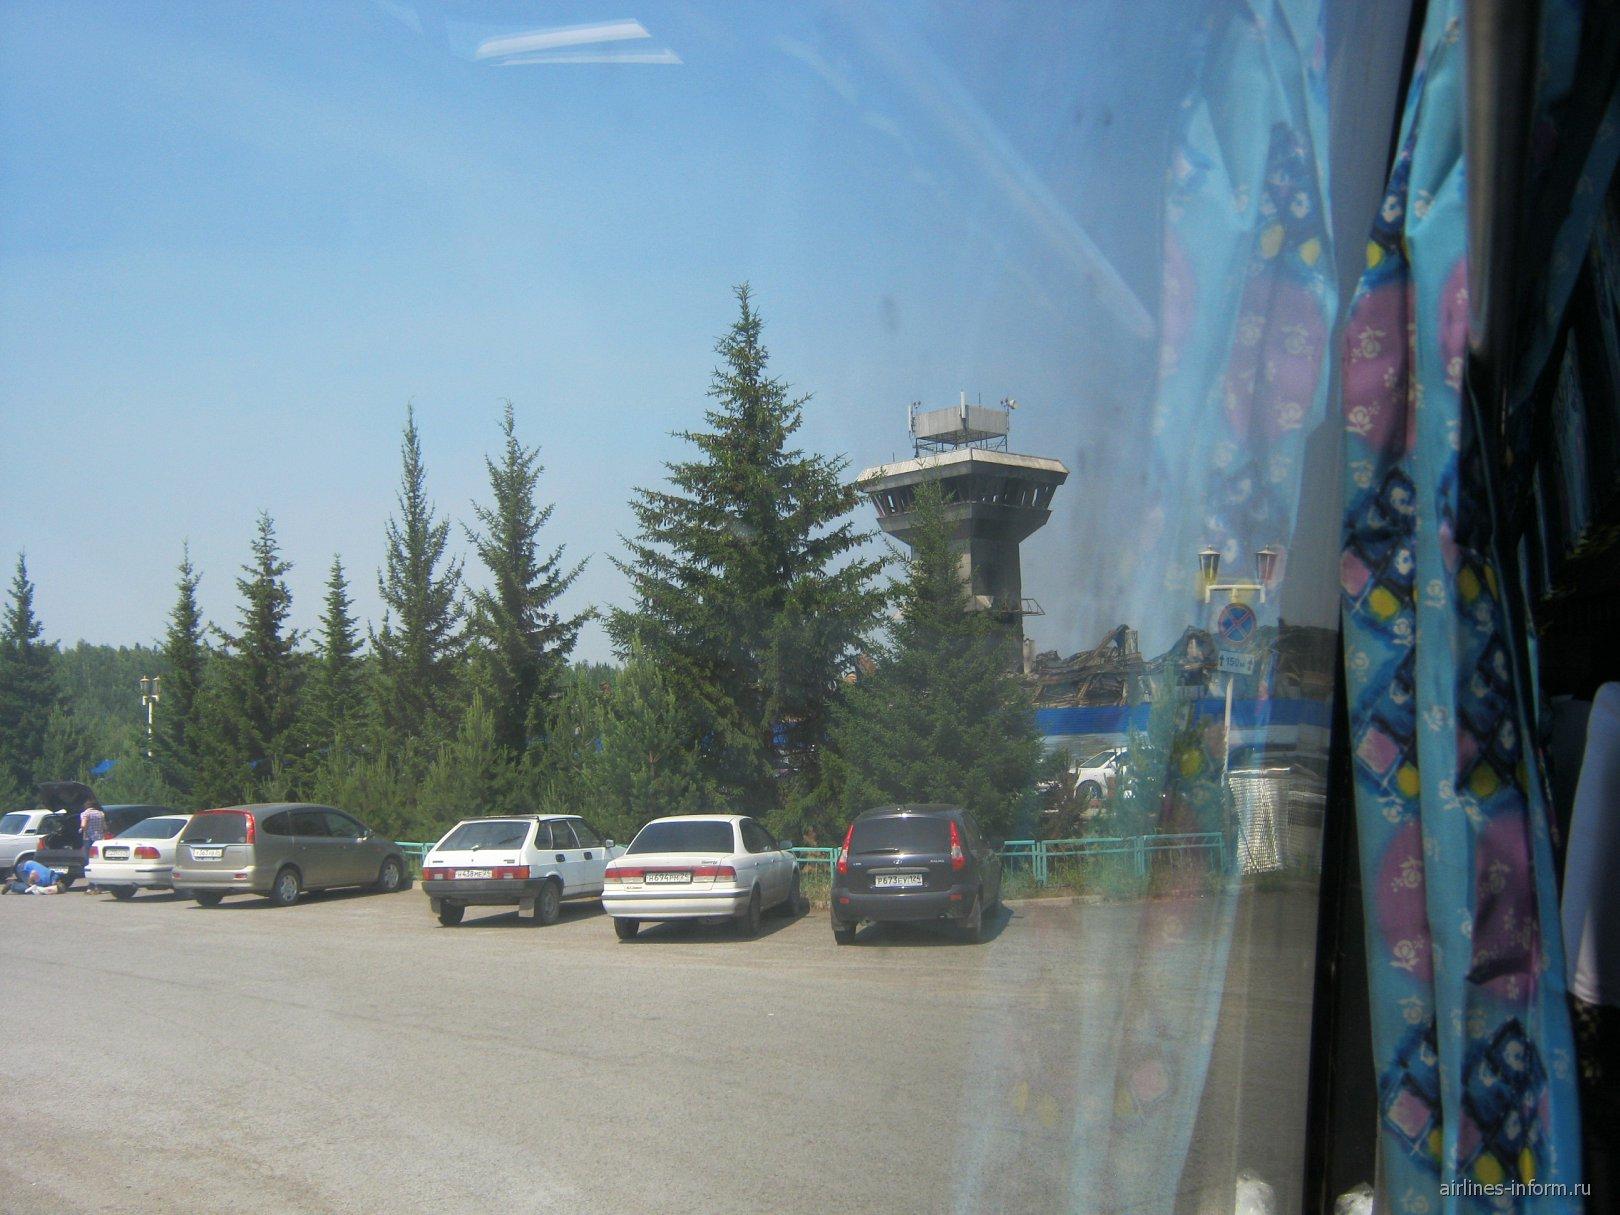 Аэропорт Красноярск Черемшанка